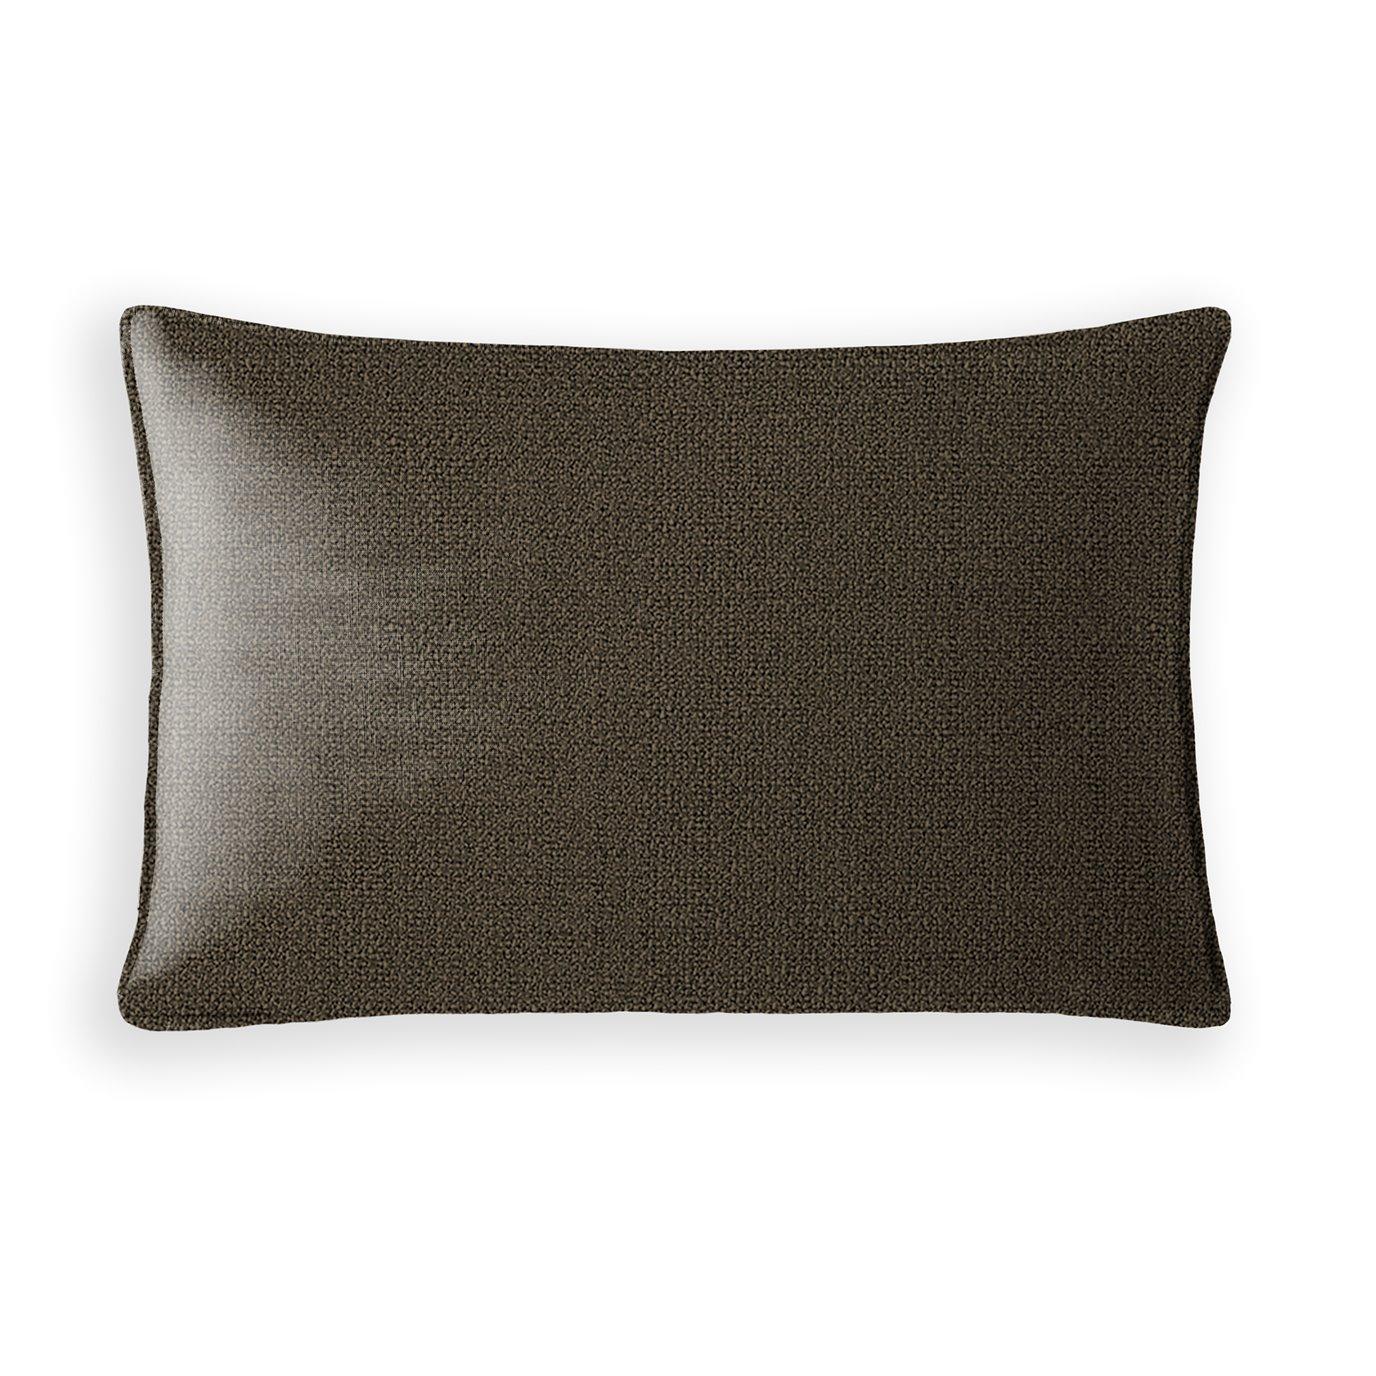 Nelson Decorative Cushion - Coordinating Boucl  - Long Rectangle